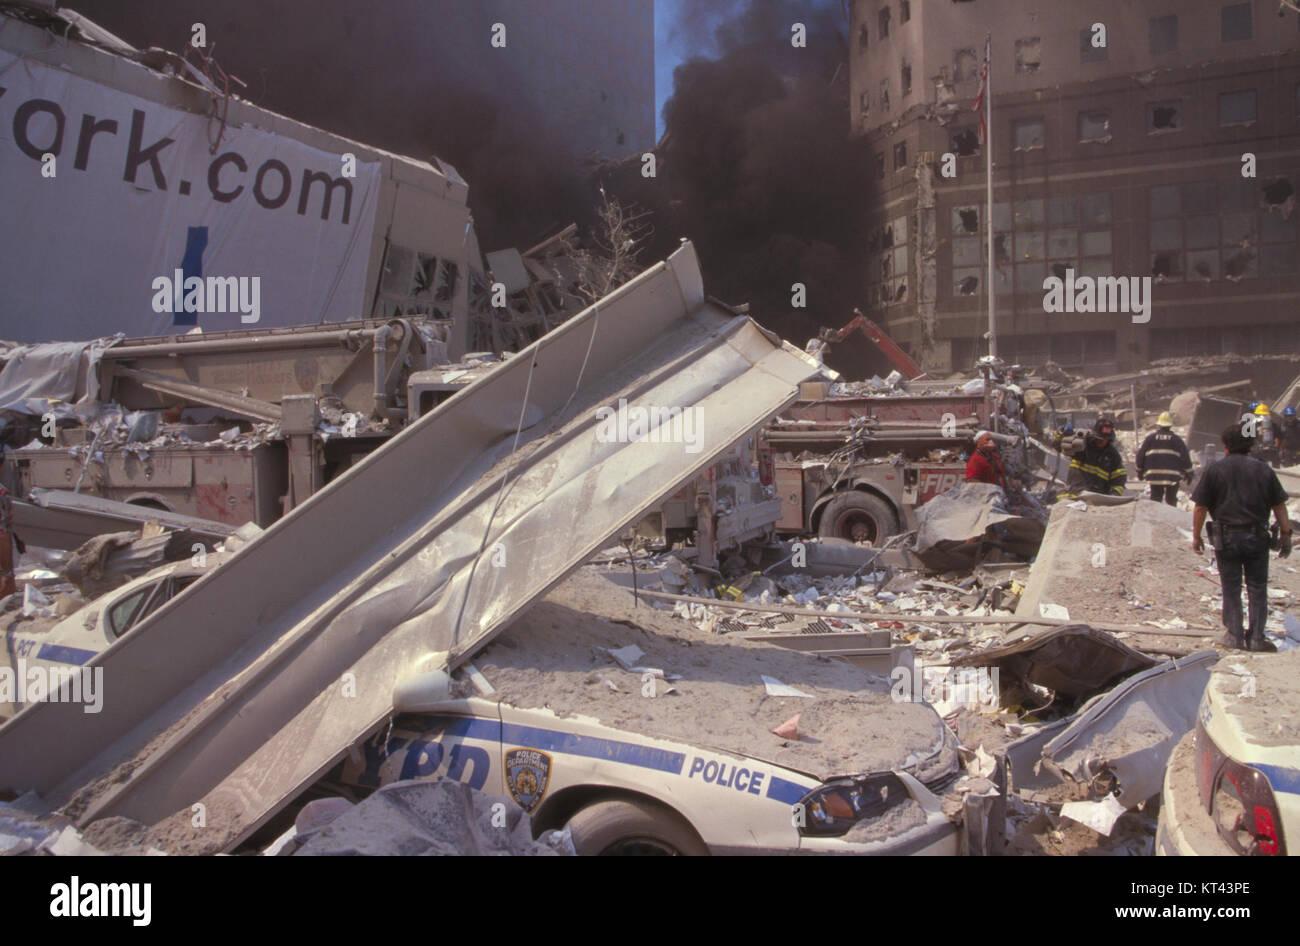 LOC unattributed Ground Zero photos, September 11, 2001 - item 111 - Stock Image